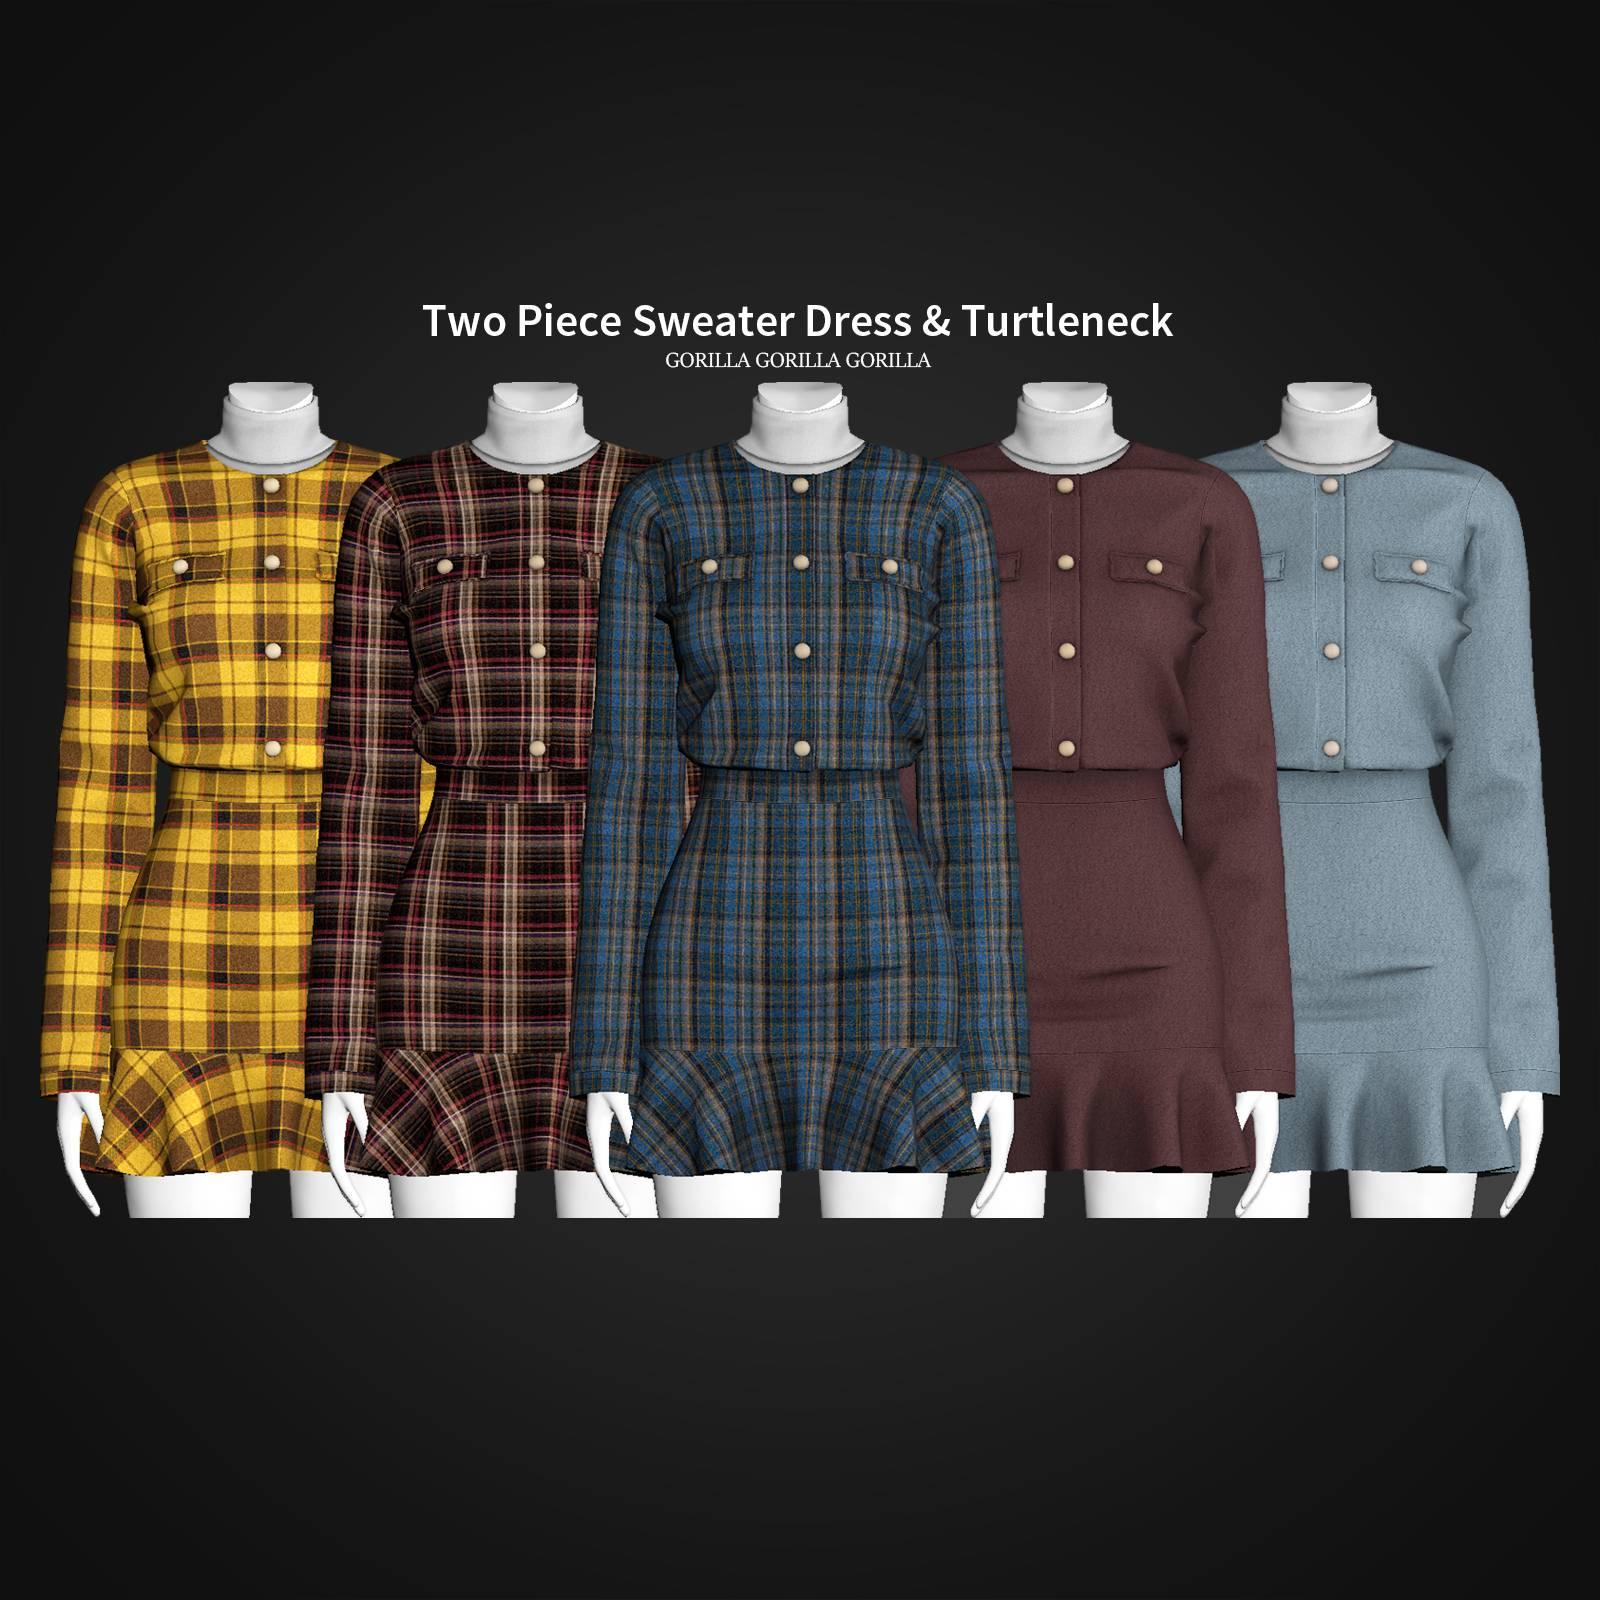 Жакет и юбка - Two Piece Sweater Dress & Turtleneck